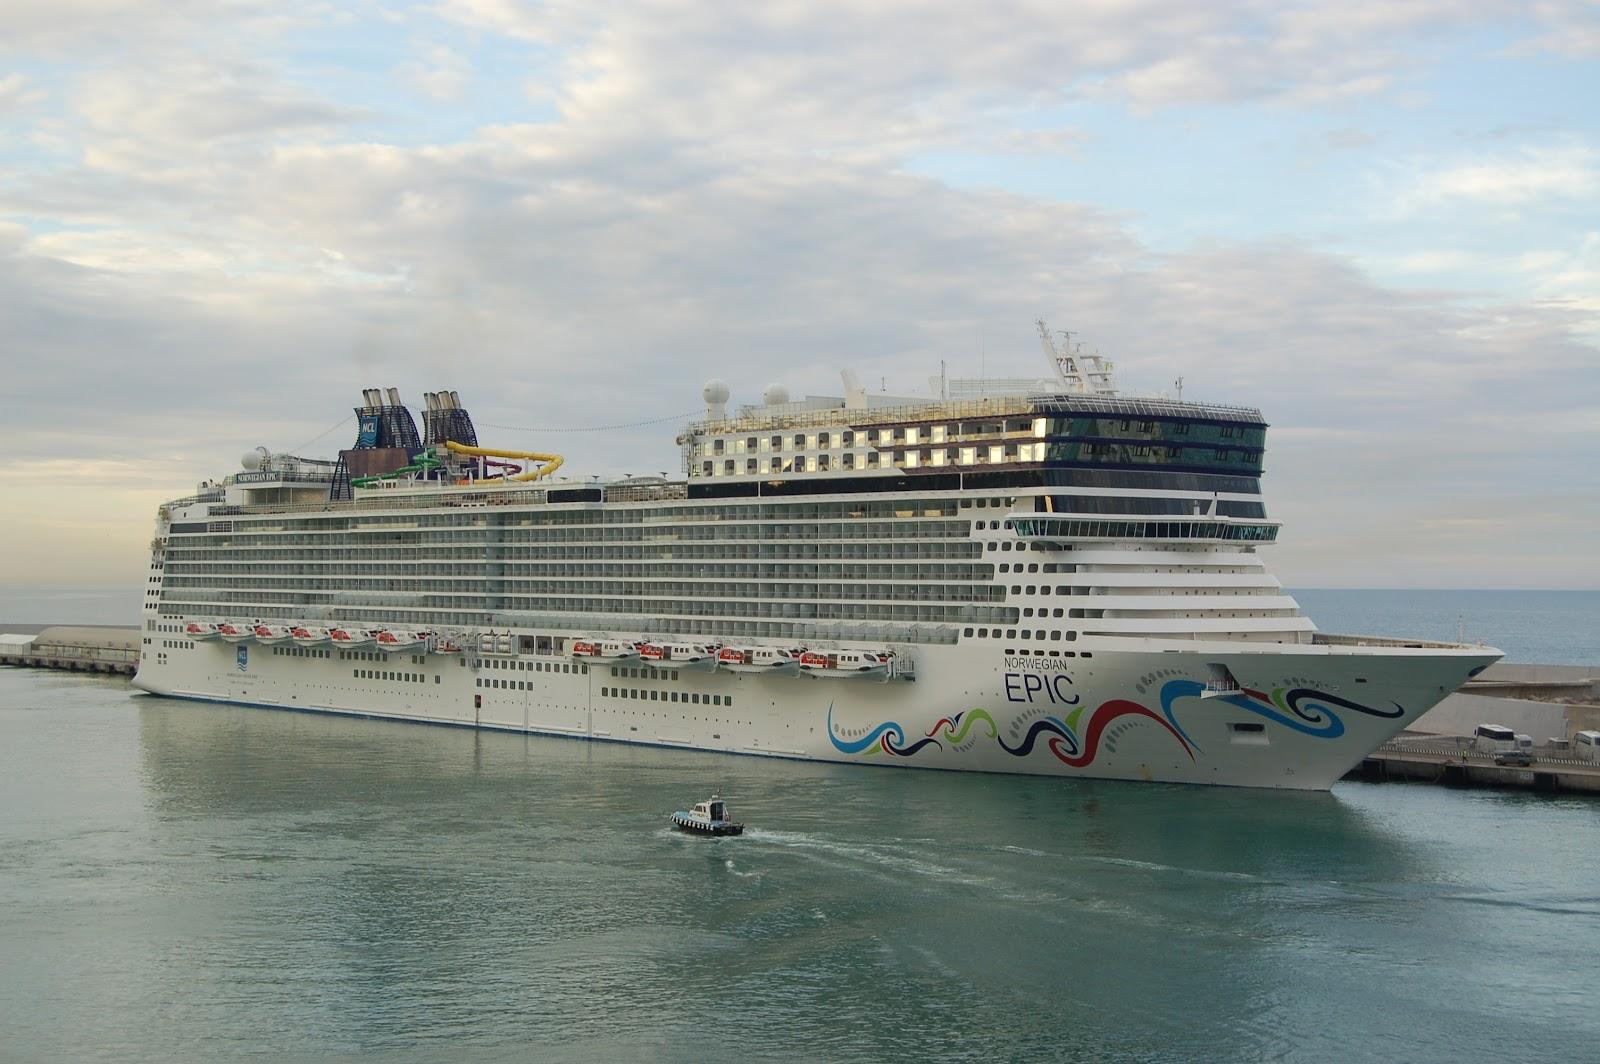 Ships in my life adonia cruise part 5 civ - Cruise port rome civitavecchia ...